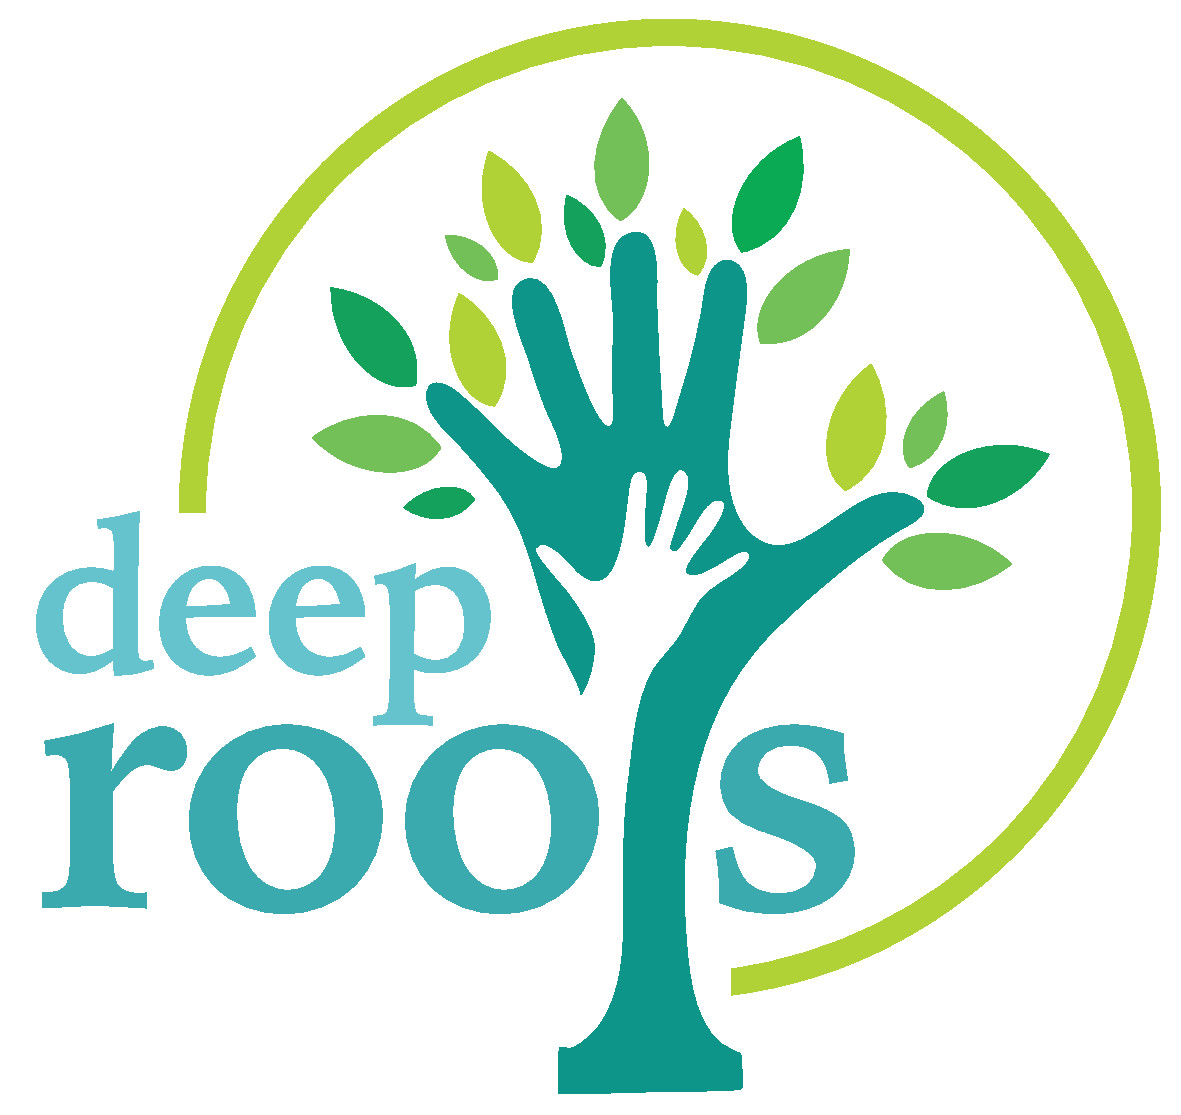 Deep Roots logo